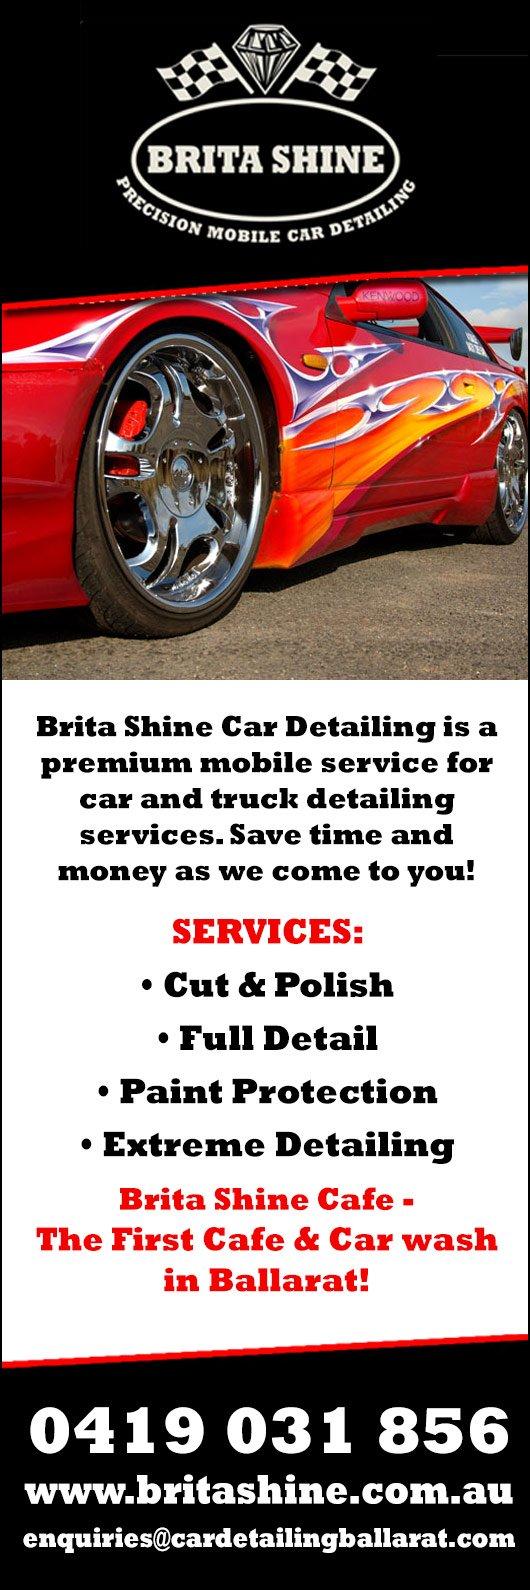 Brita shine promotion people also viewed car detailing